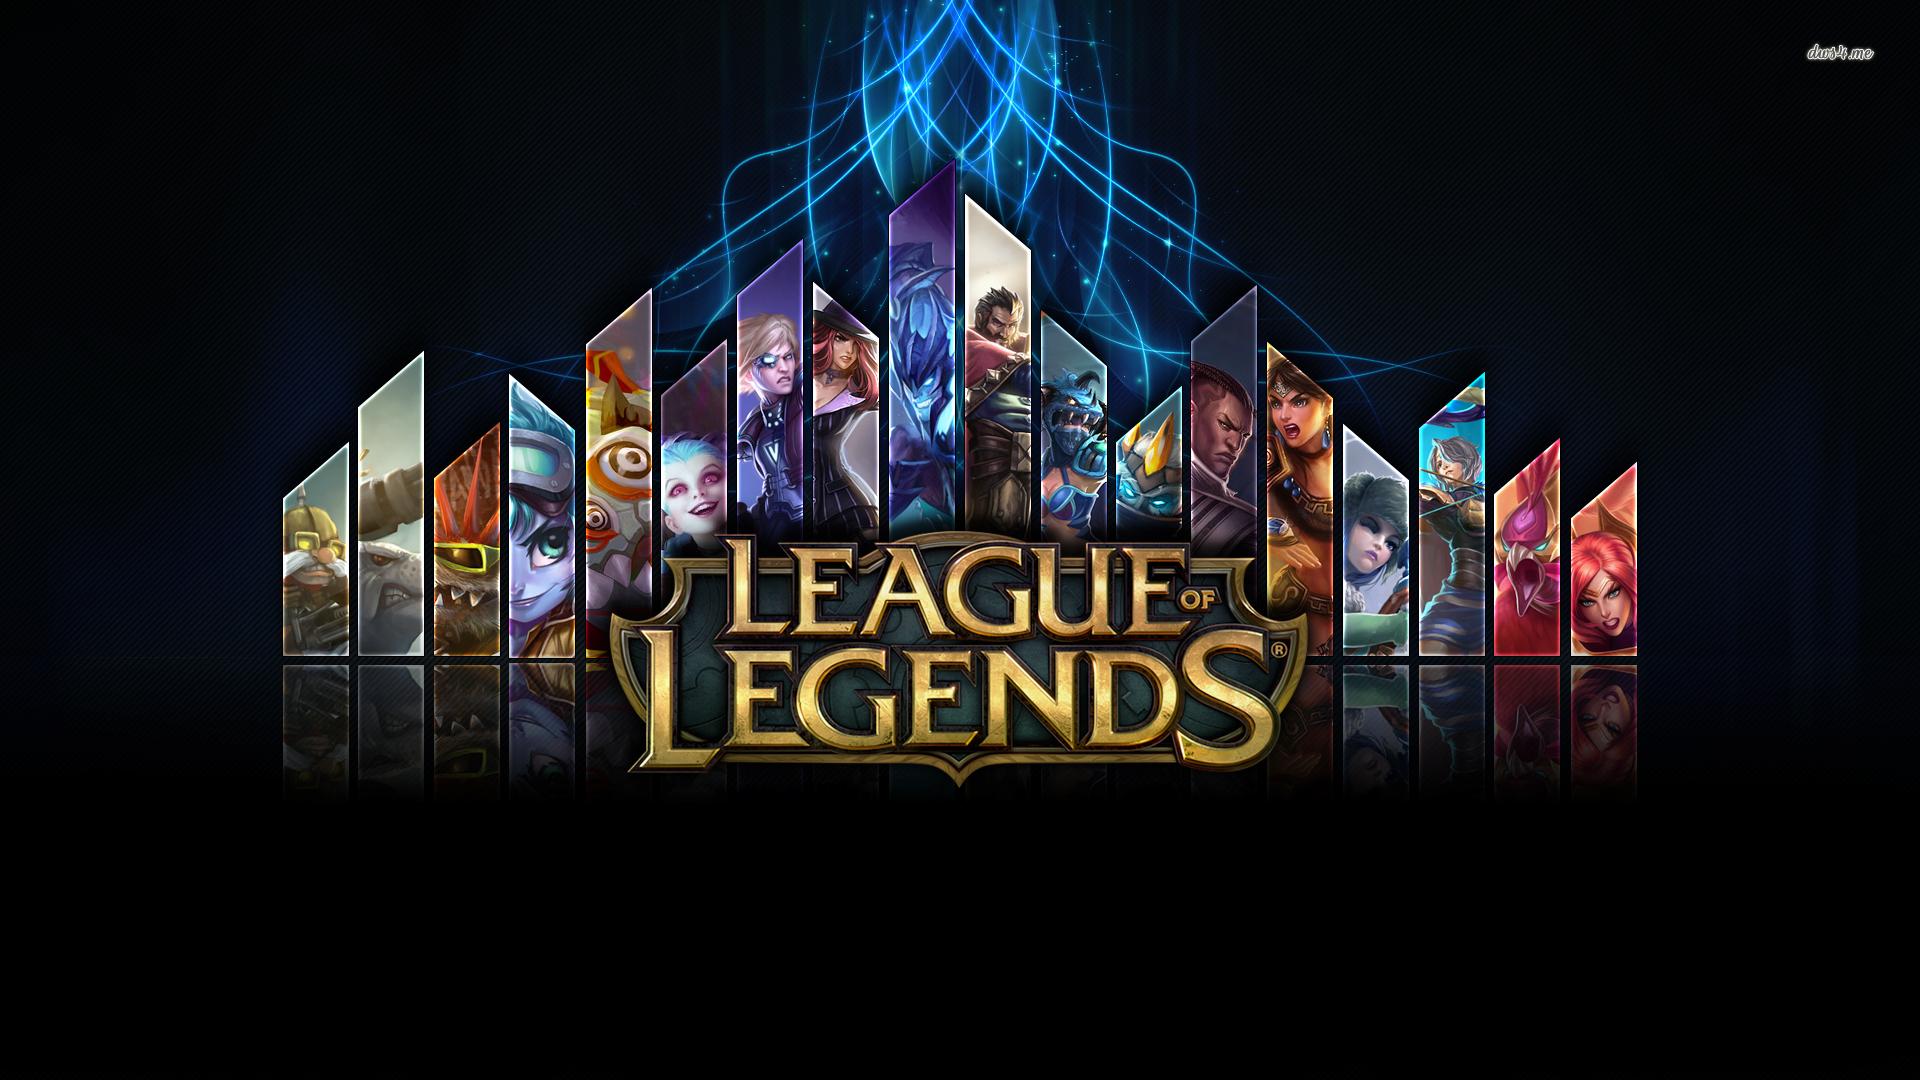 22002-league-of-legends-1920x1080-game-wallpaper